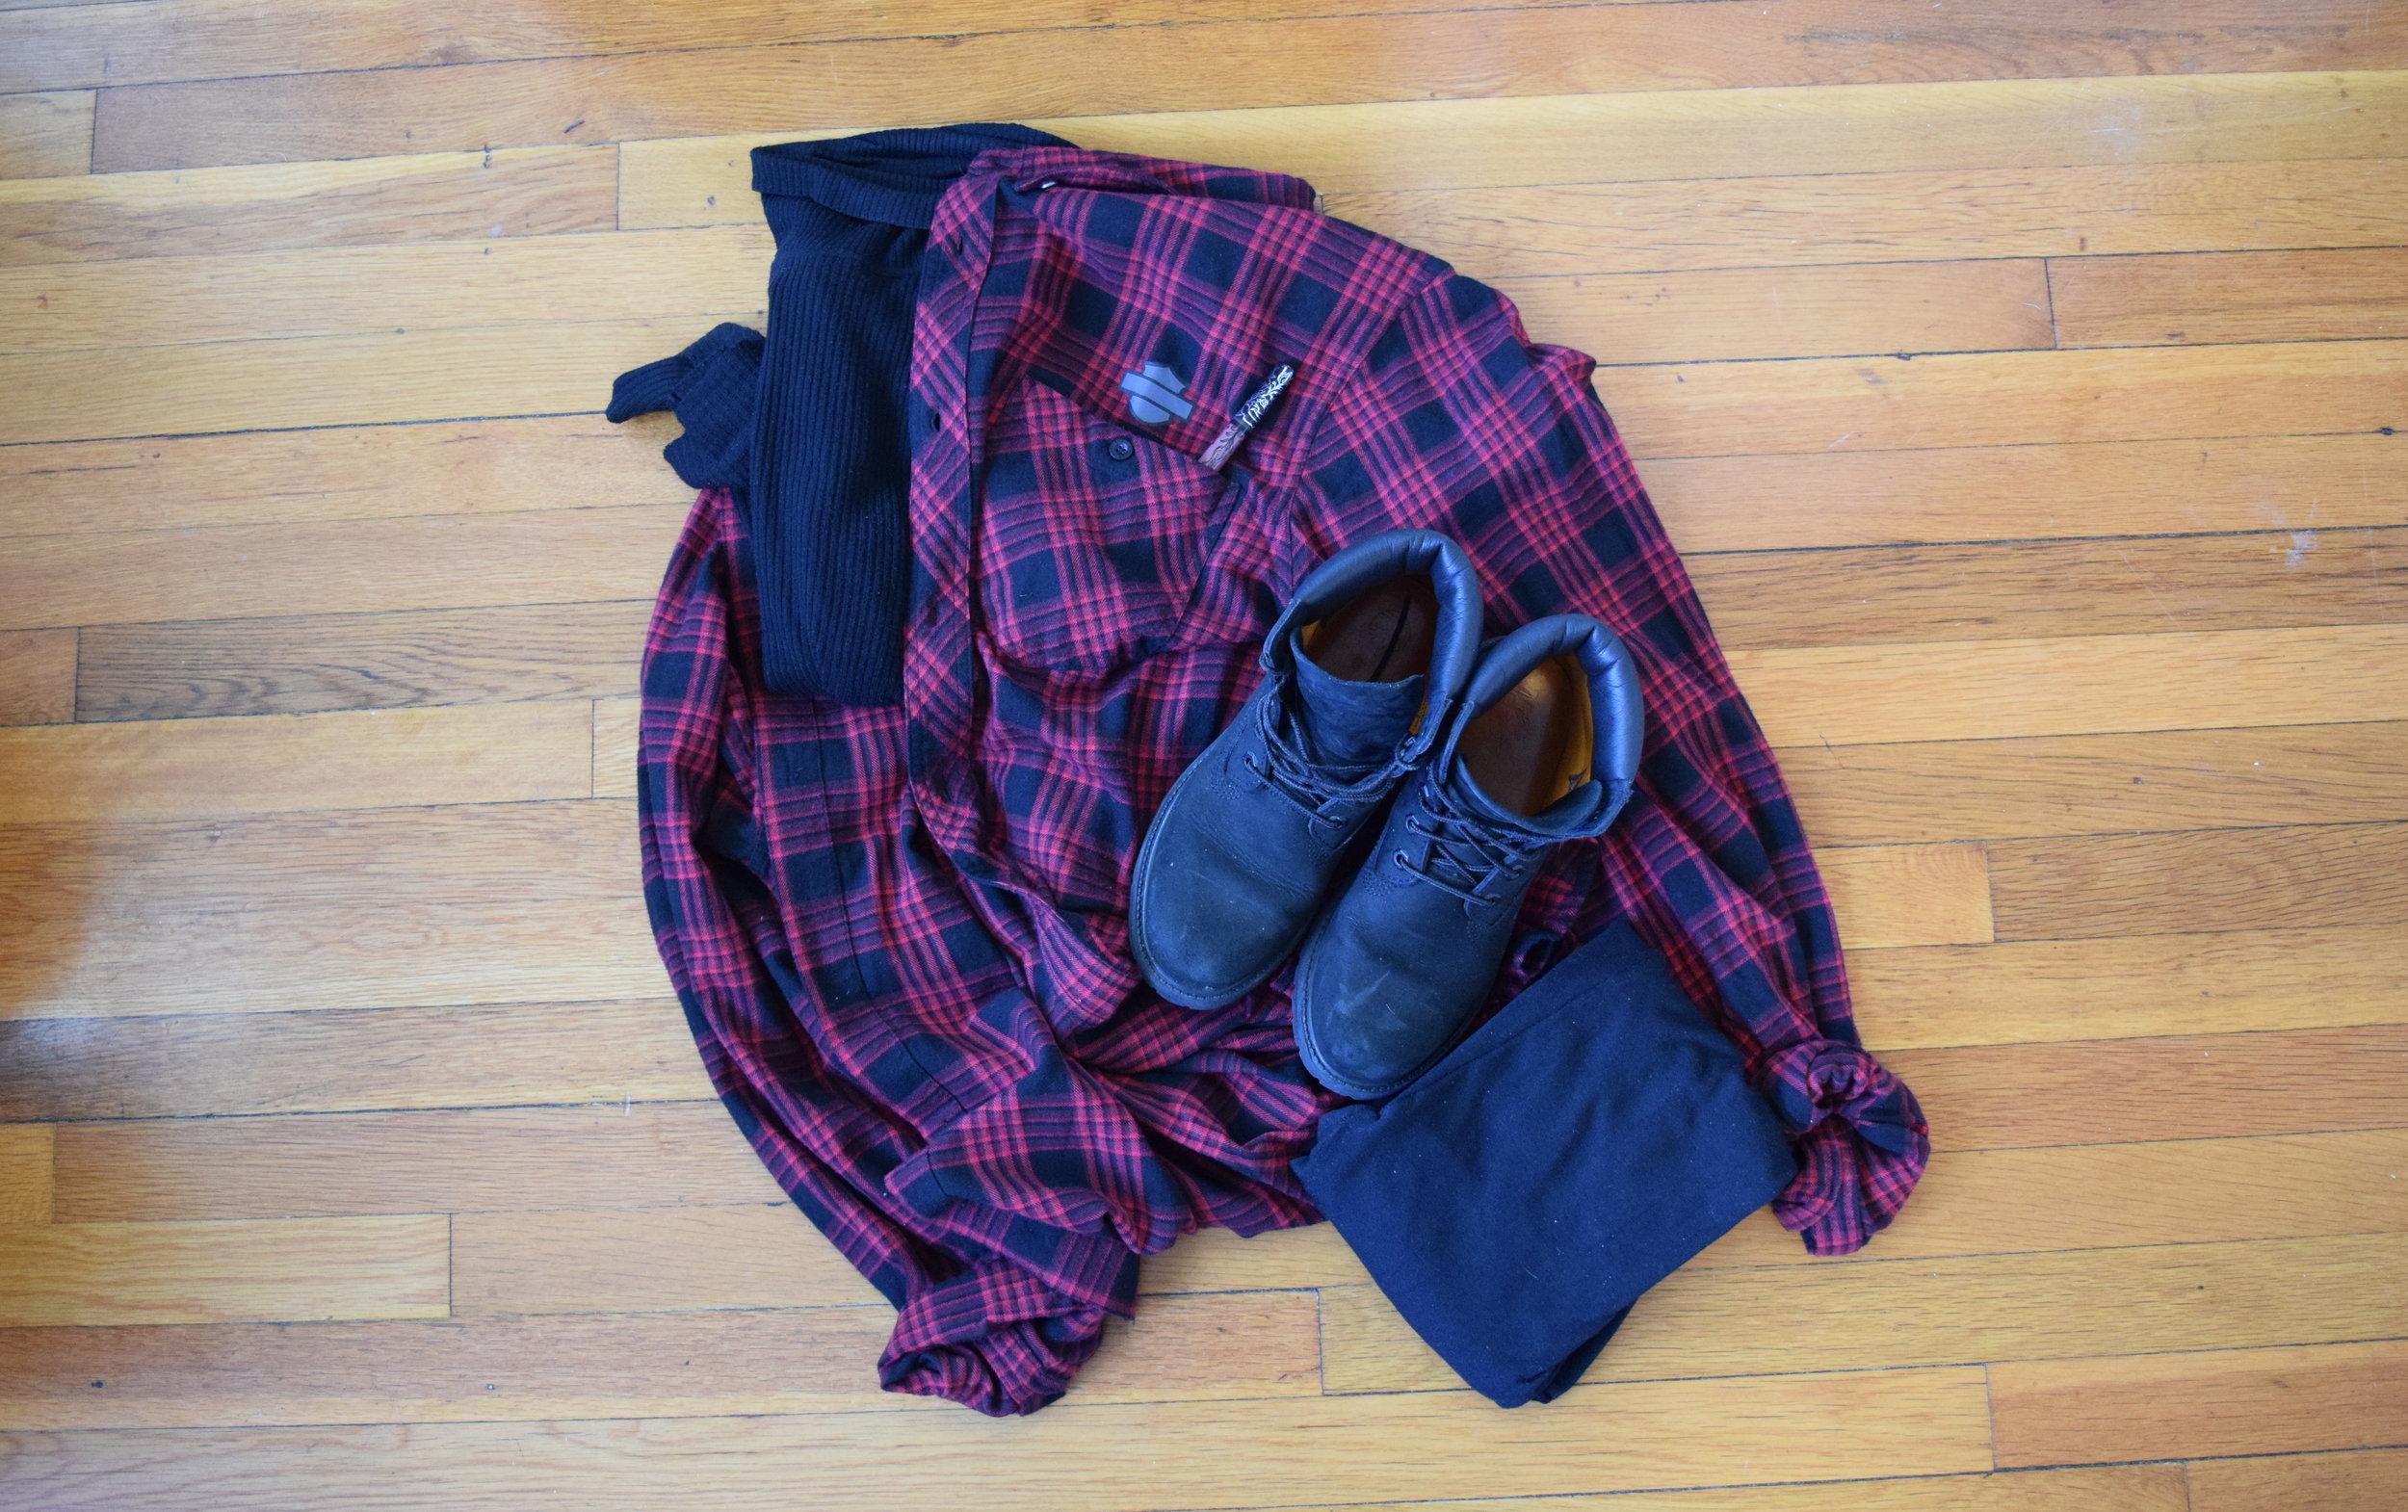 turtleneck  (similar).  flannel .  leggings .  boots .  lipgloss  (in sanctuary).